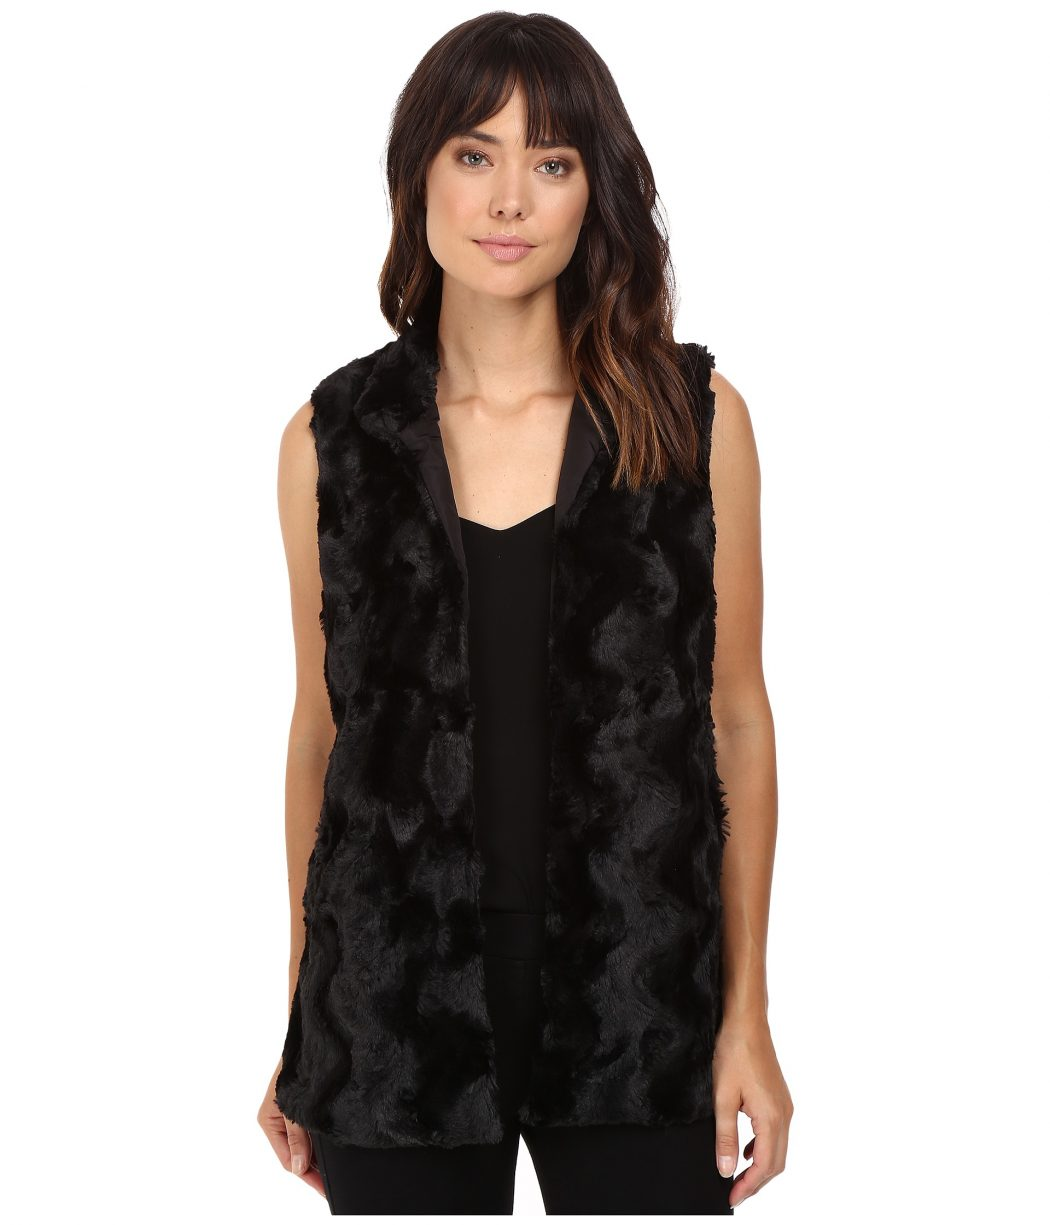 Fur-Vest1 8 Main Winter & Fall Jackets & Coats Trends in 2020